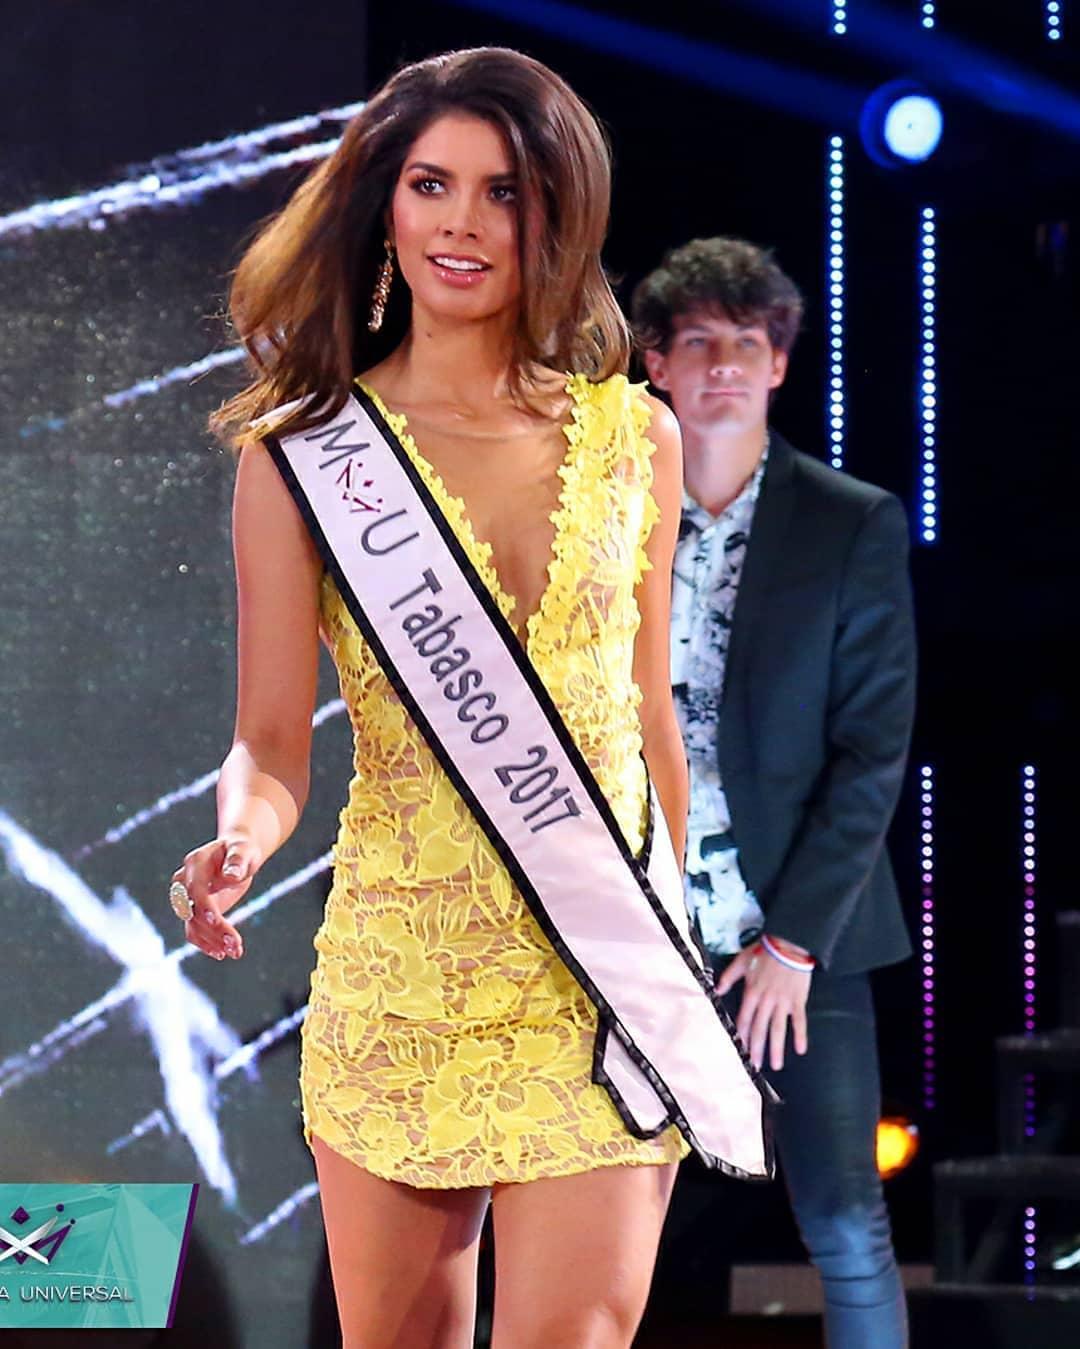 aranza molina, 1 finalista de reyna hispanoamericana 2018. - Página 2 30076210